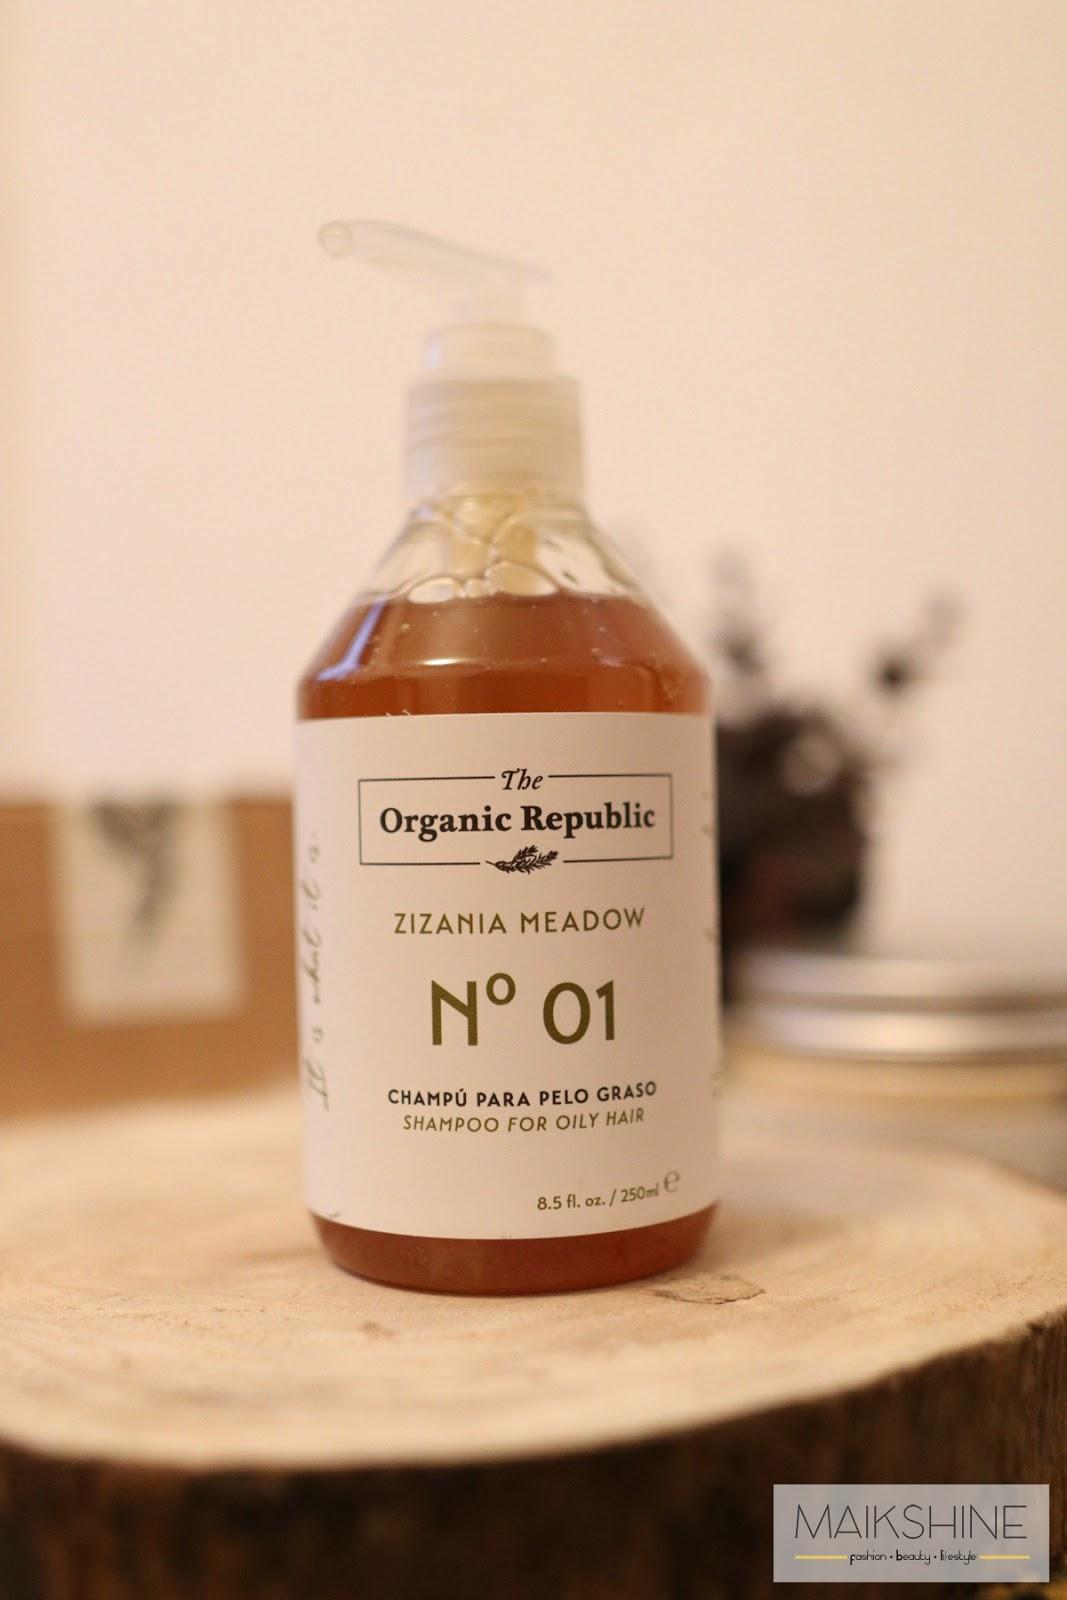 Champú The Organic Republic